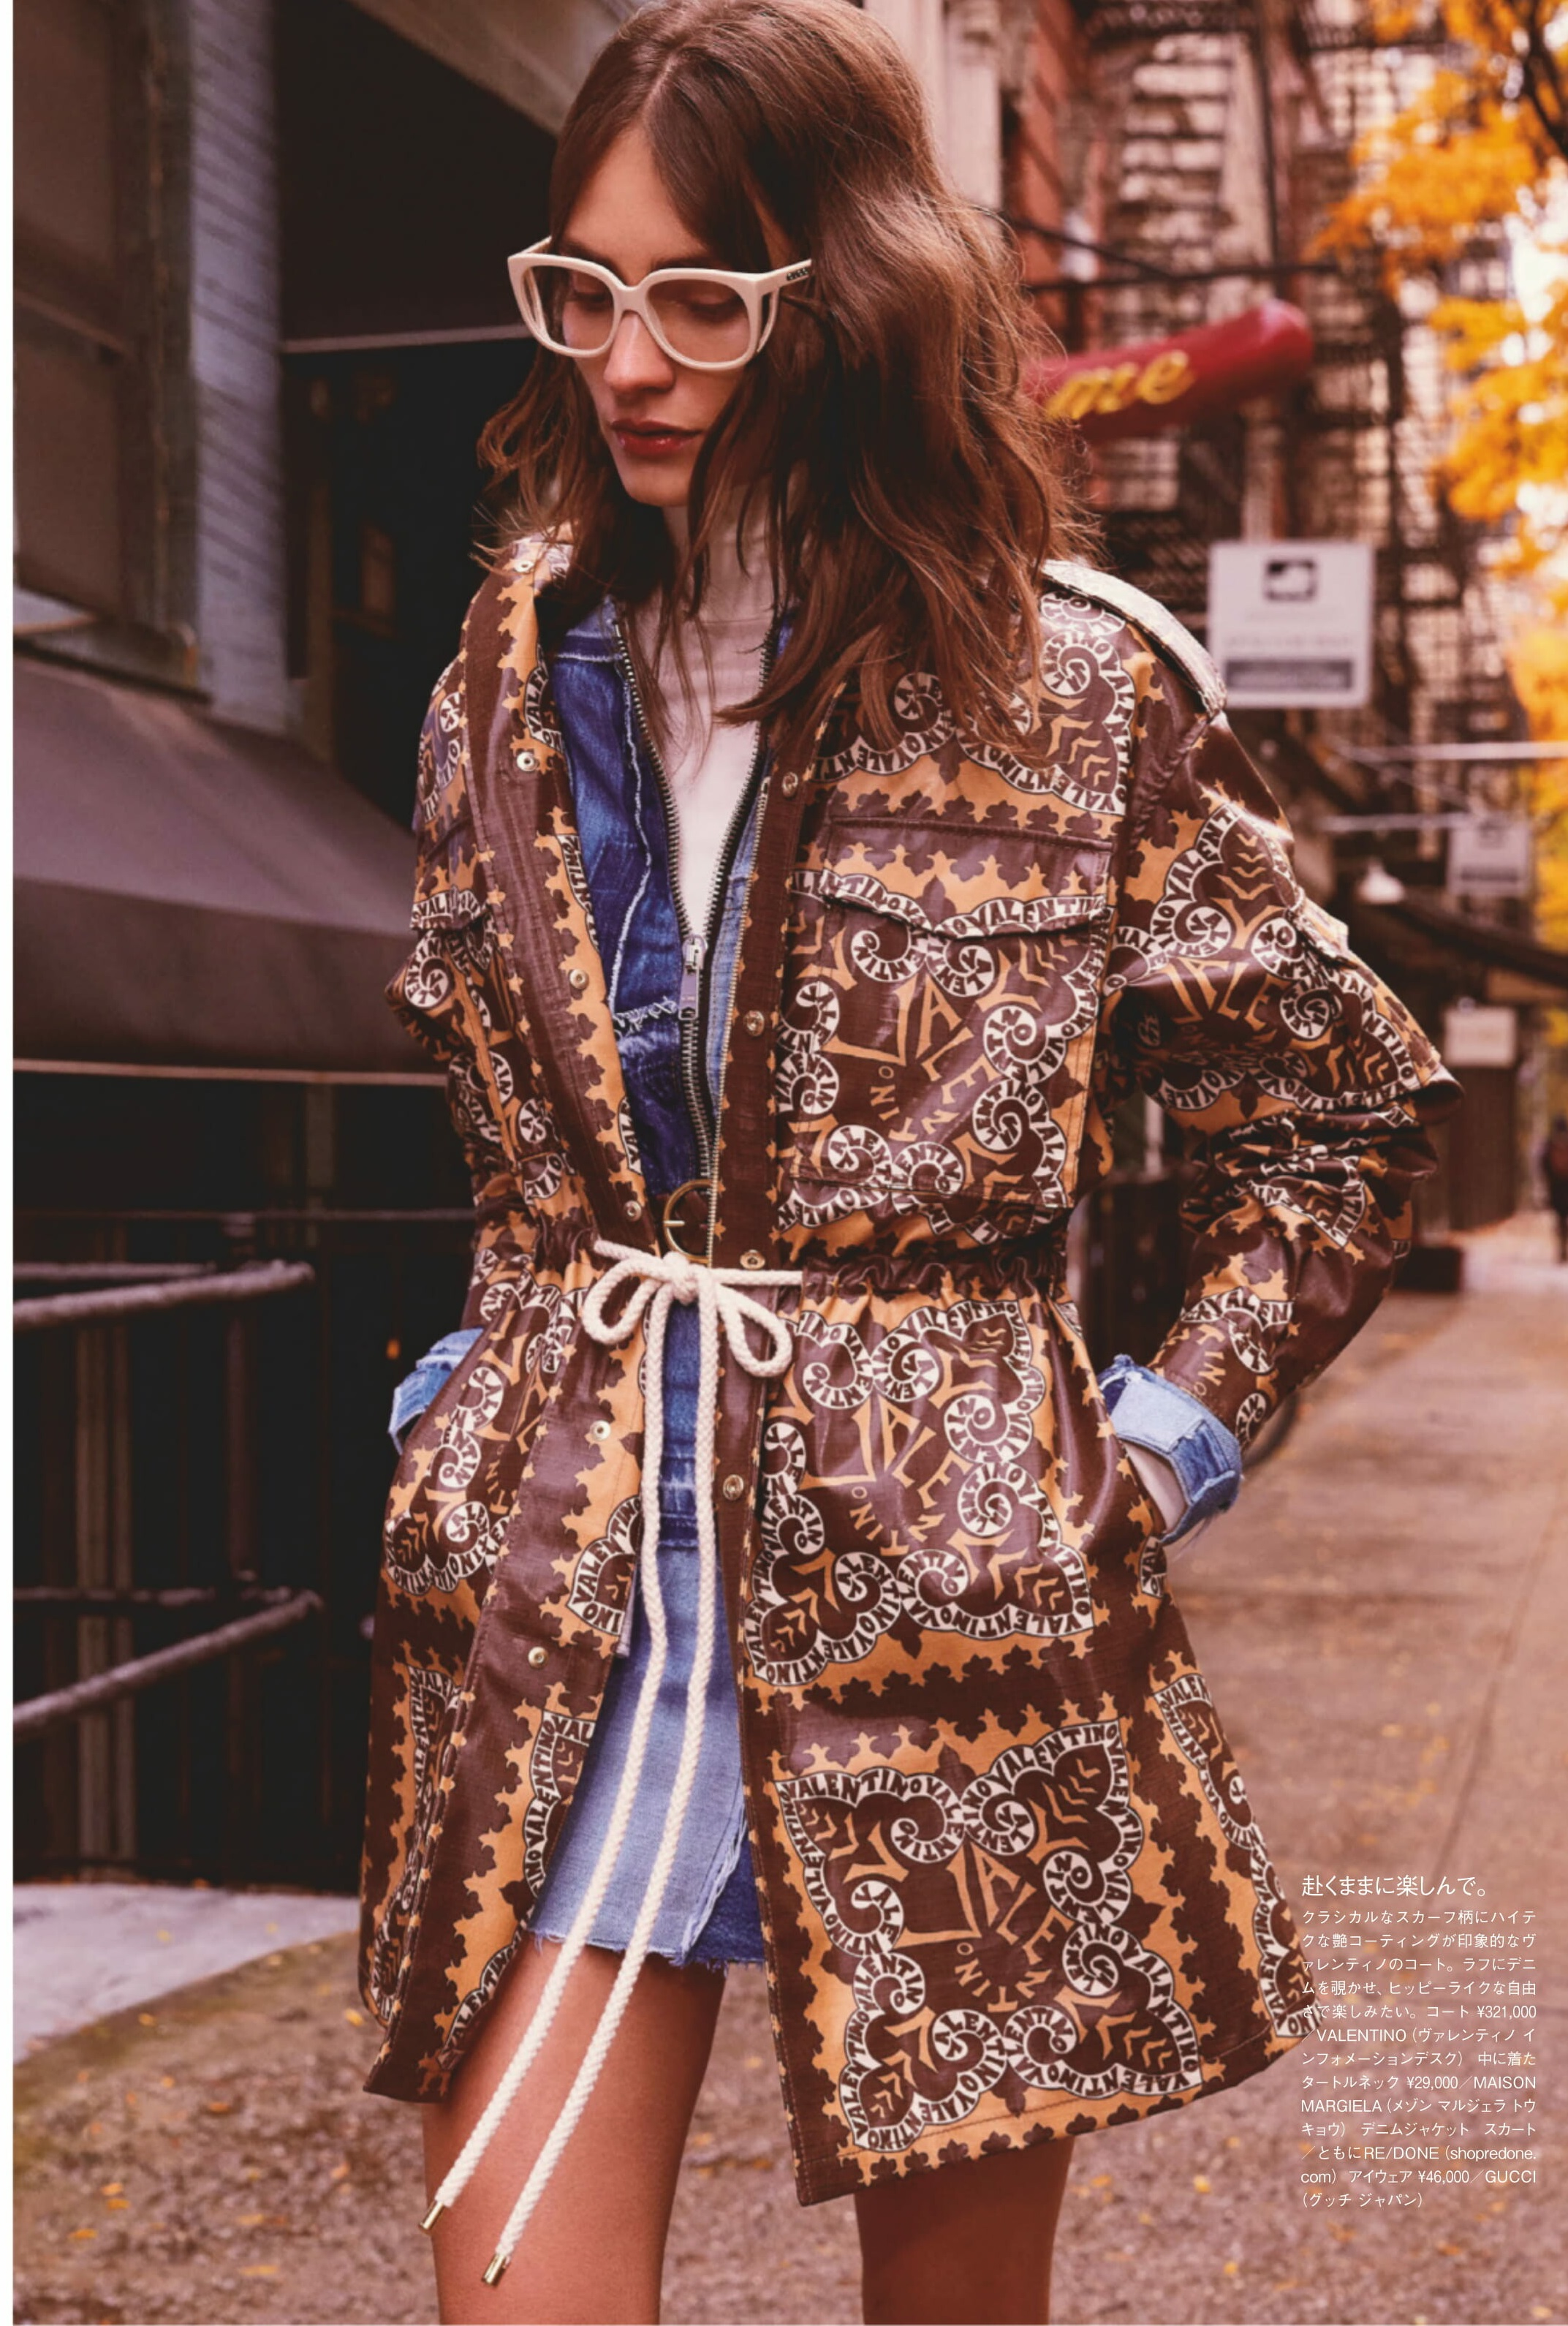 Walter Chin for Vogue Japan Feb 2019 (9).jpg